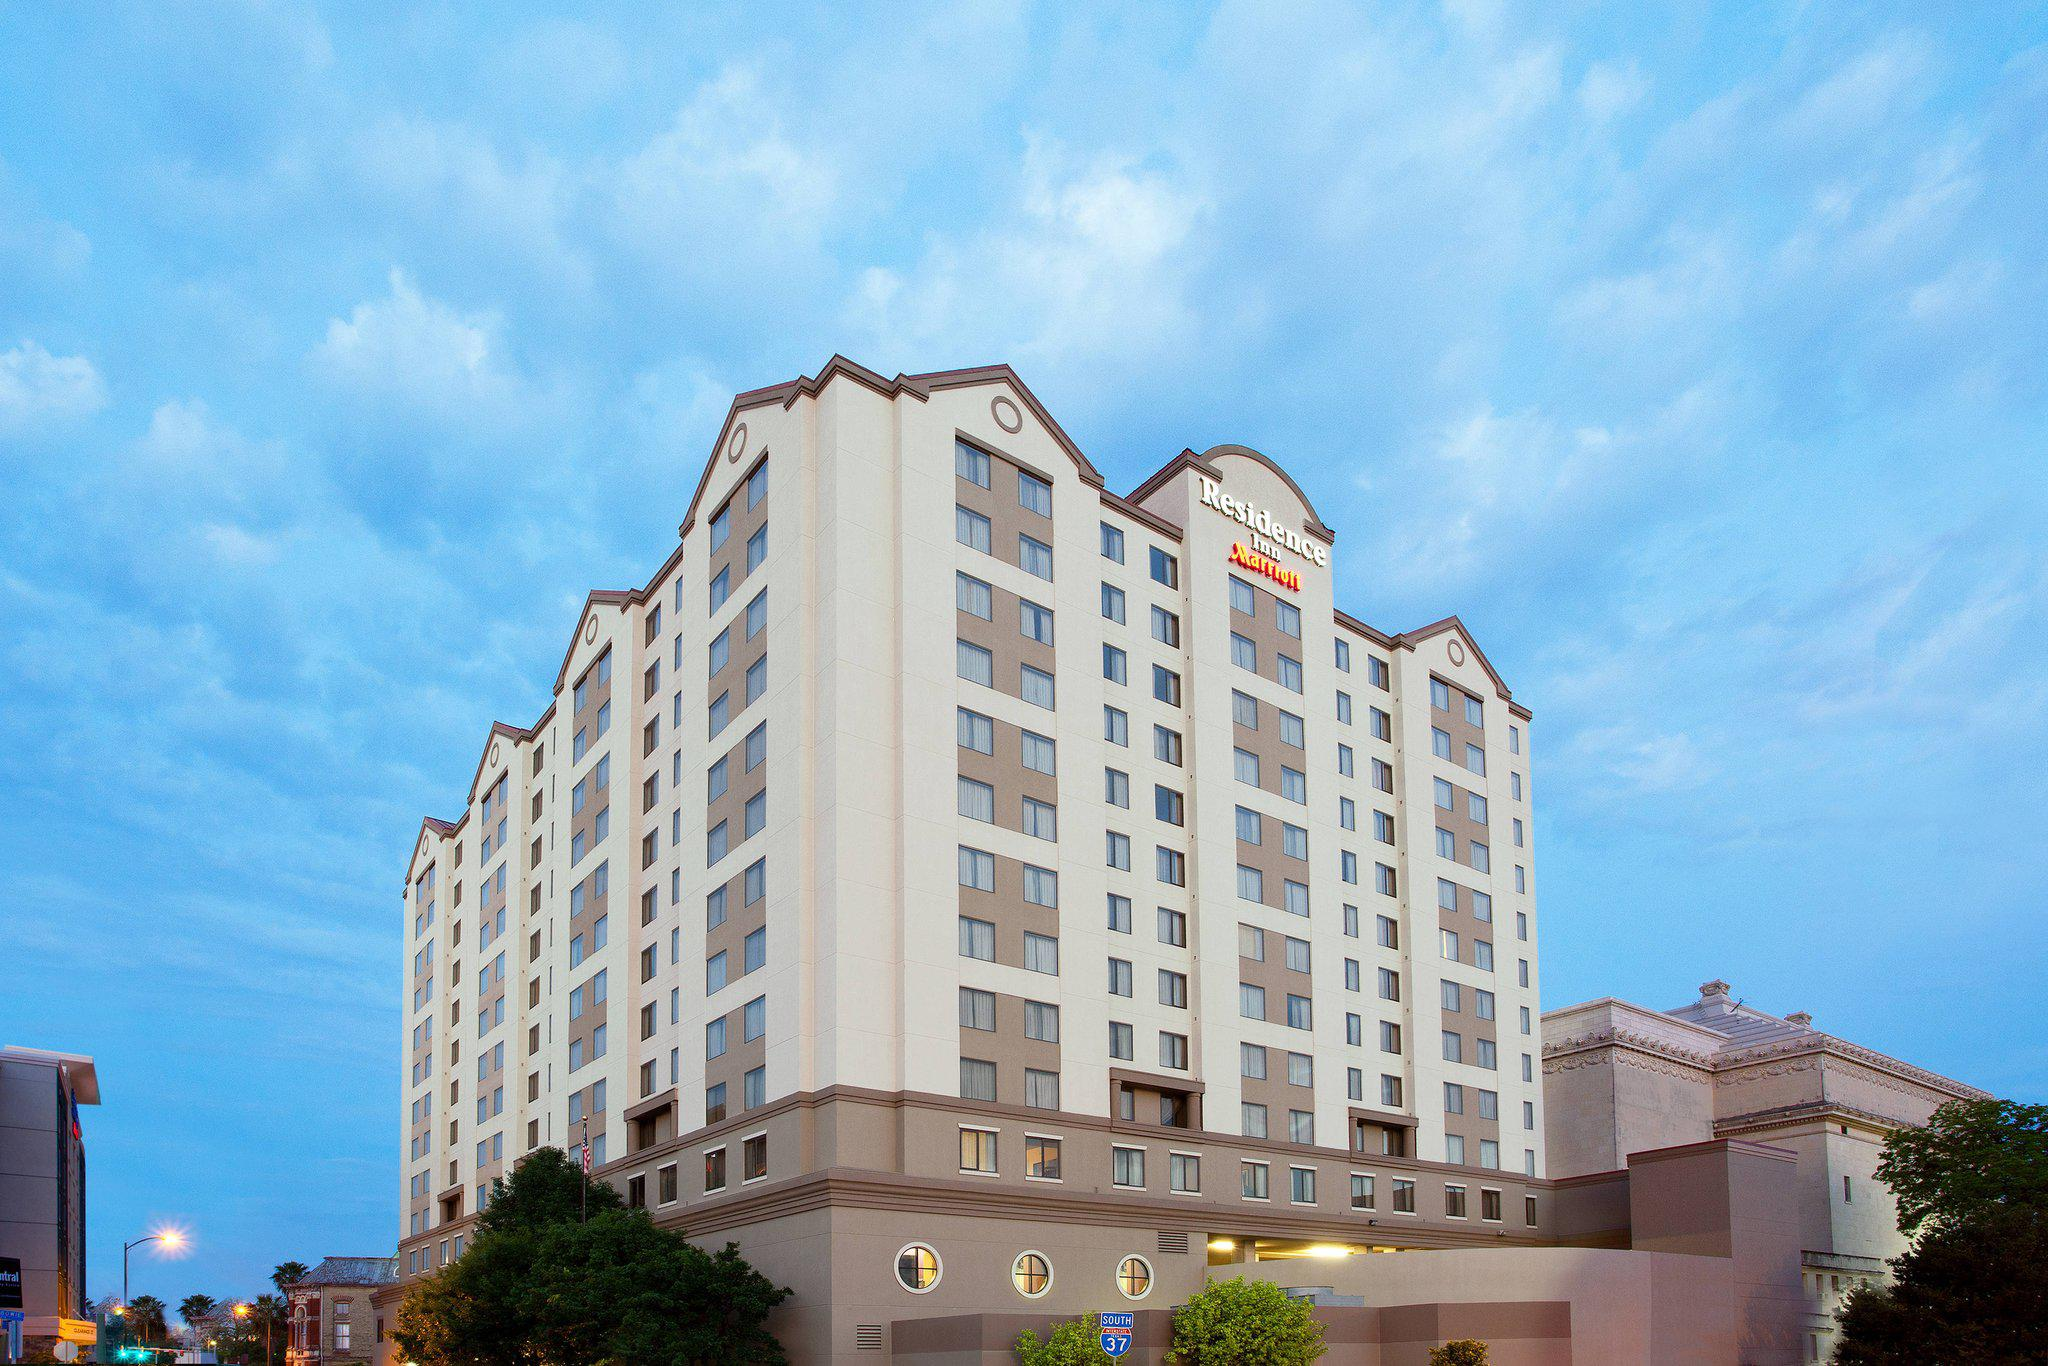 Residence Inn by Marriott San Antonio Downtown/Alamo Plaza in San Antonio, TX, photo #3